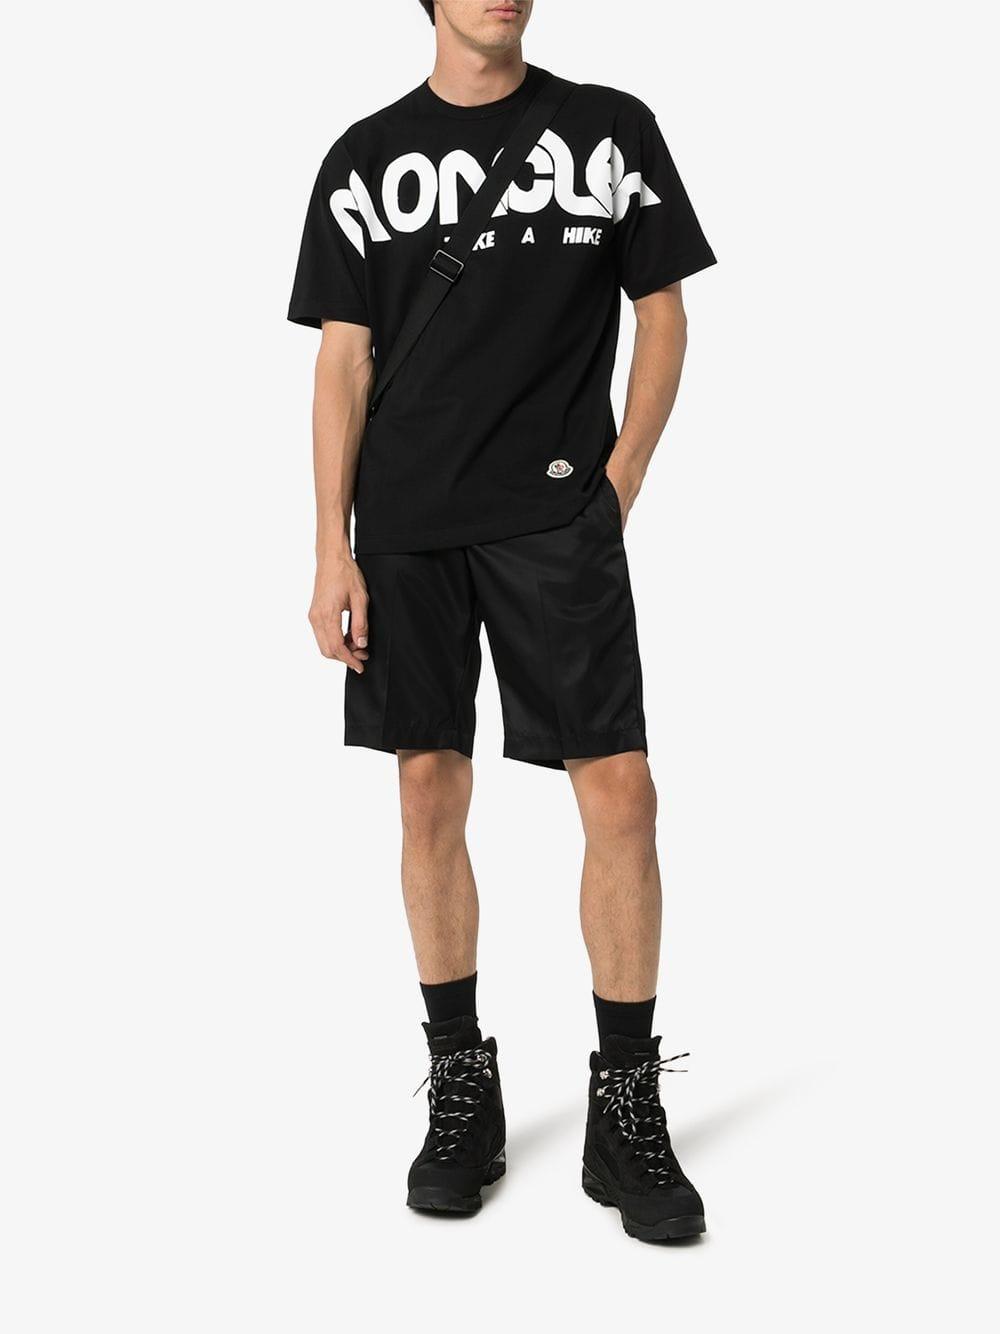 black Moncler Genius x Craig Green t.shirt MONCLER GENIUS |  | 80300-50-8390T999